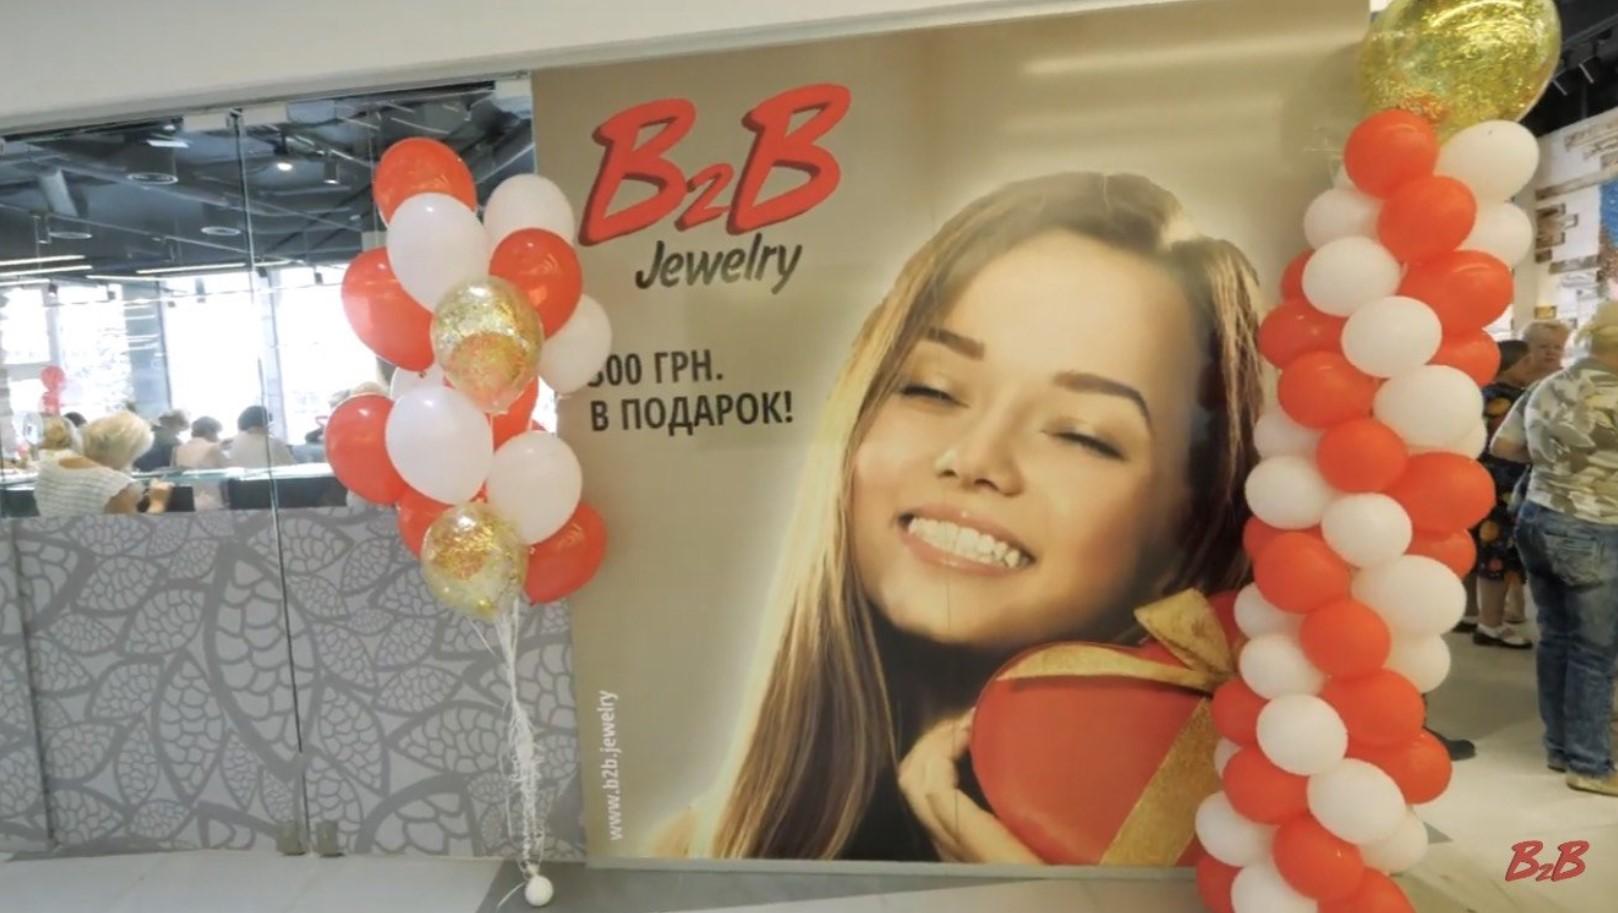 Открытие магазина В2В Jewelry в Запорожье. Відкриття магазину В2В Jewelry в Запоріжжі